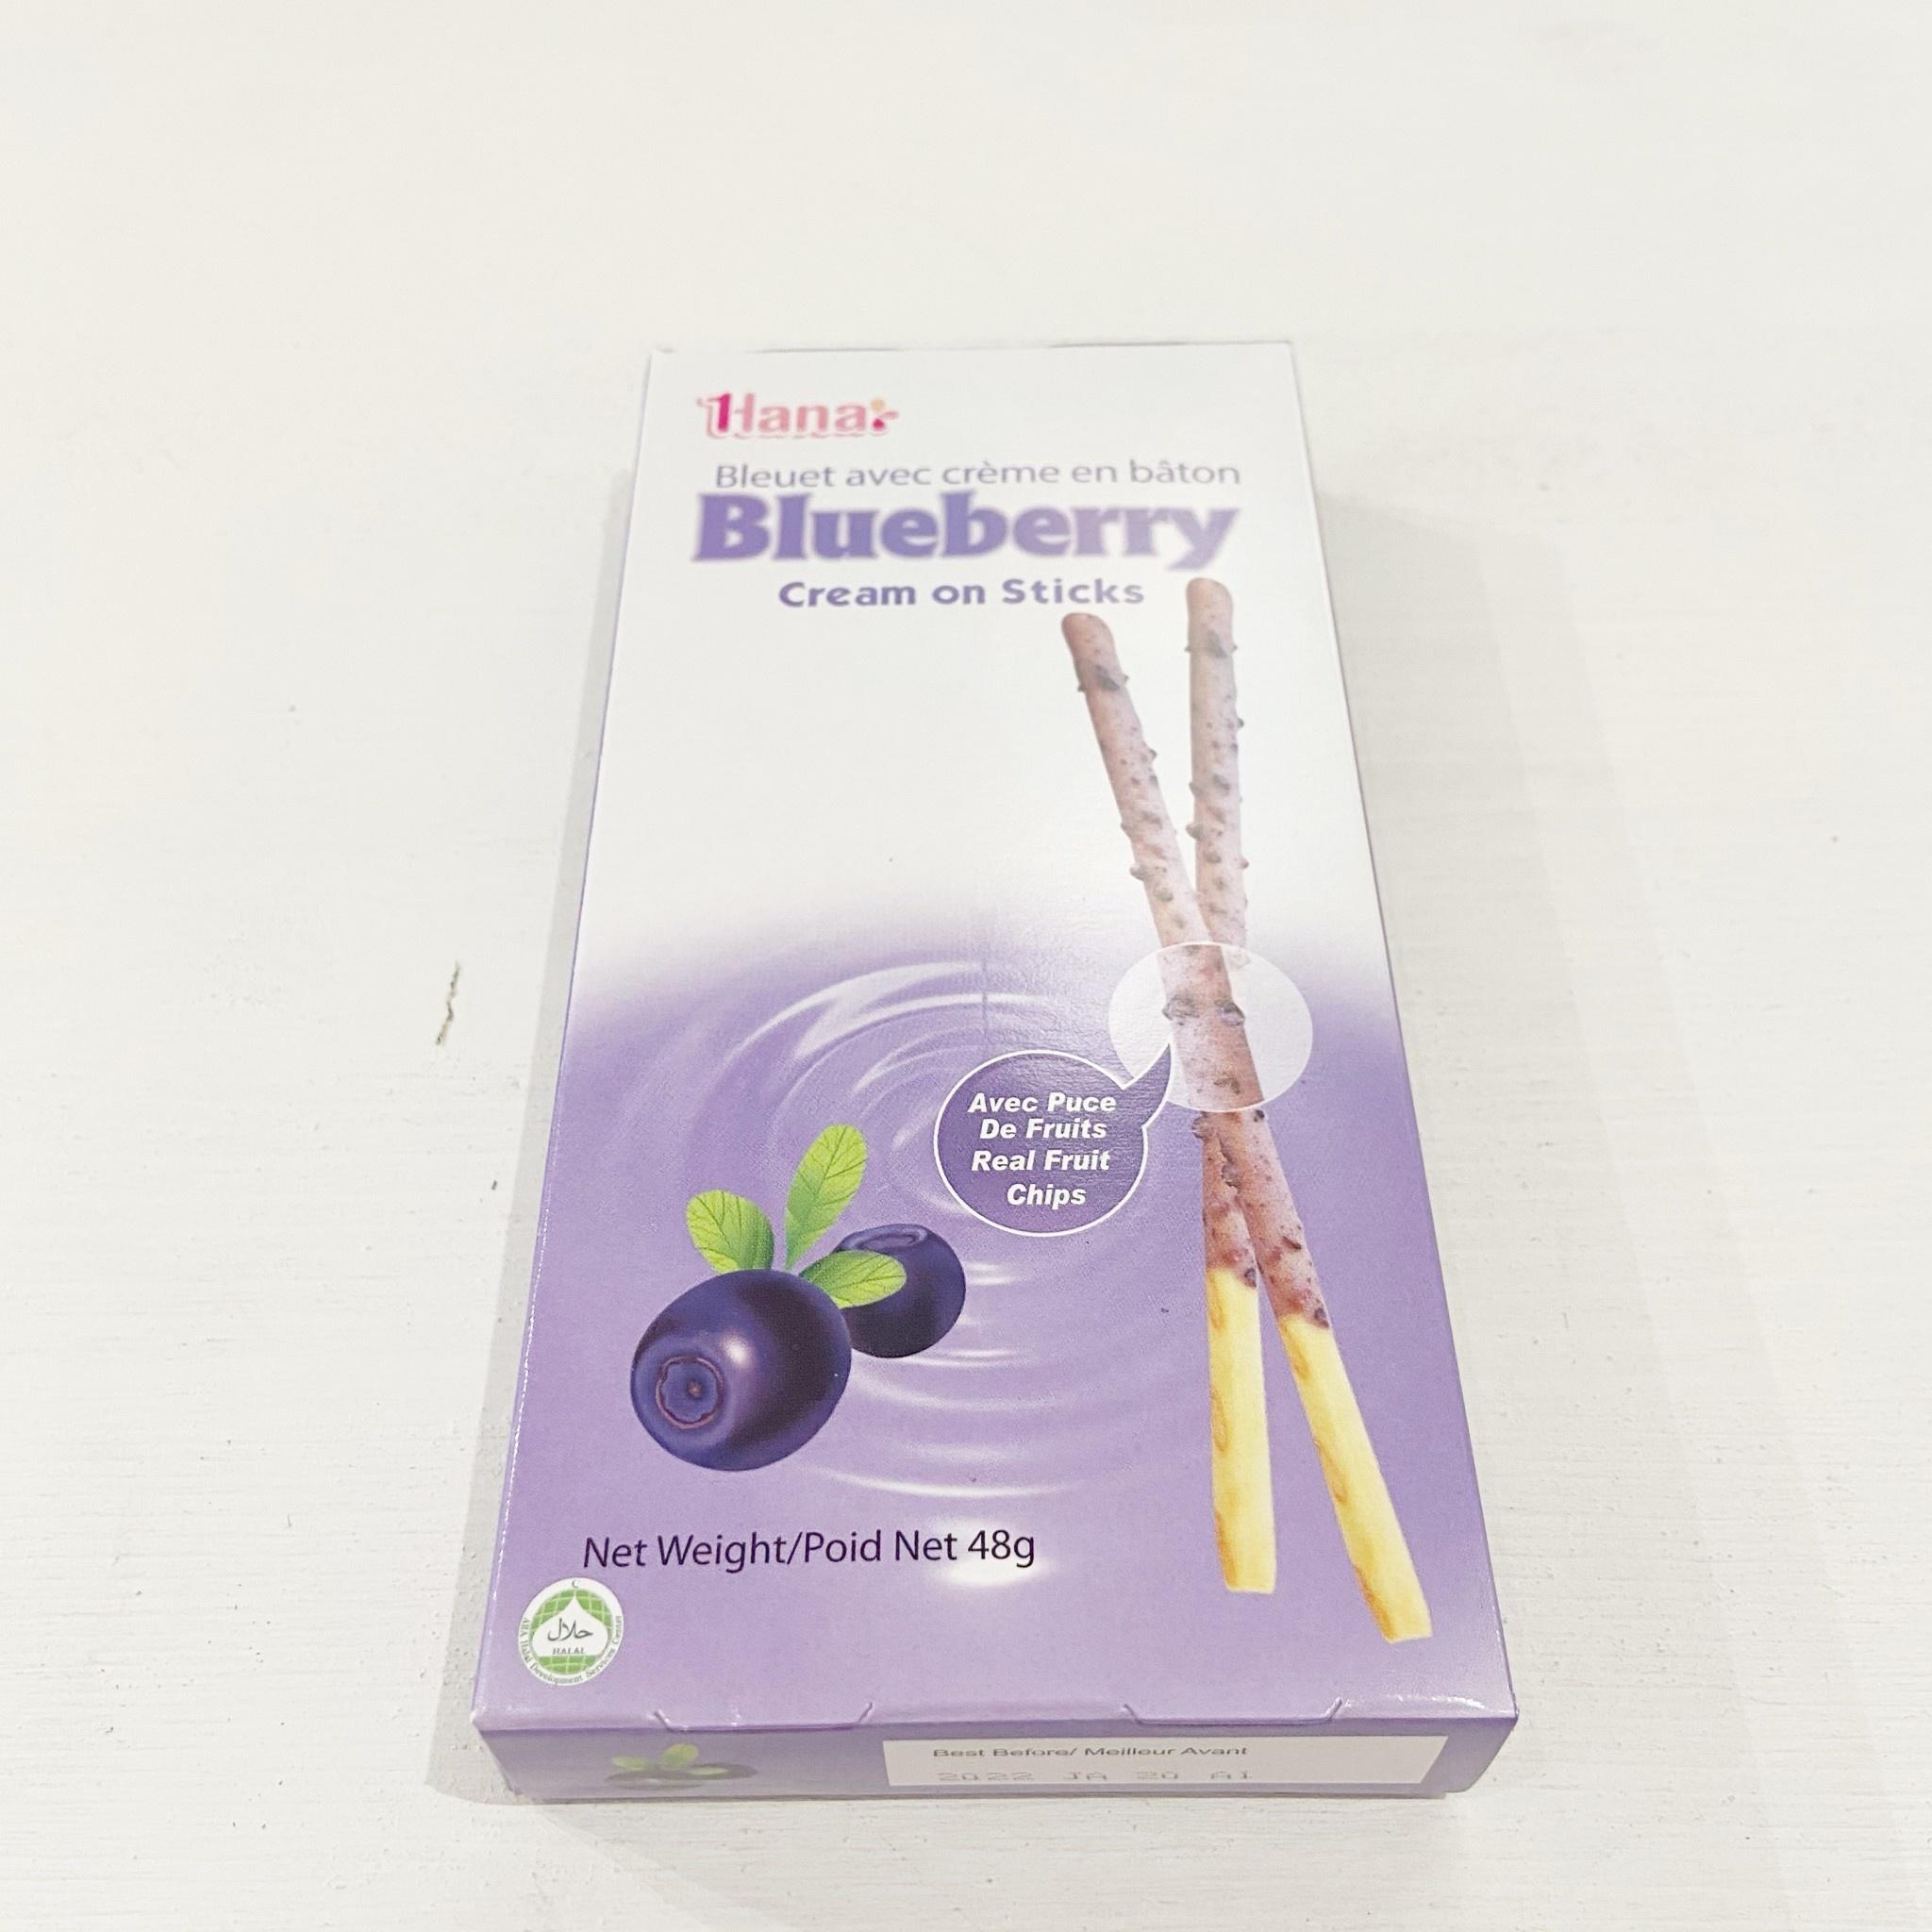 Hana Cream on Stick Blueberry 48g